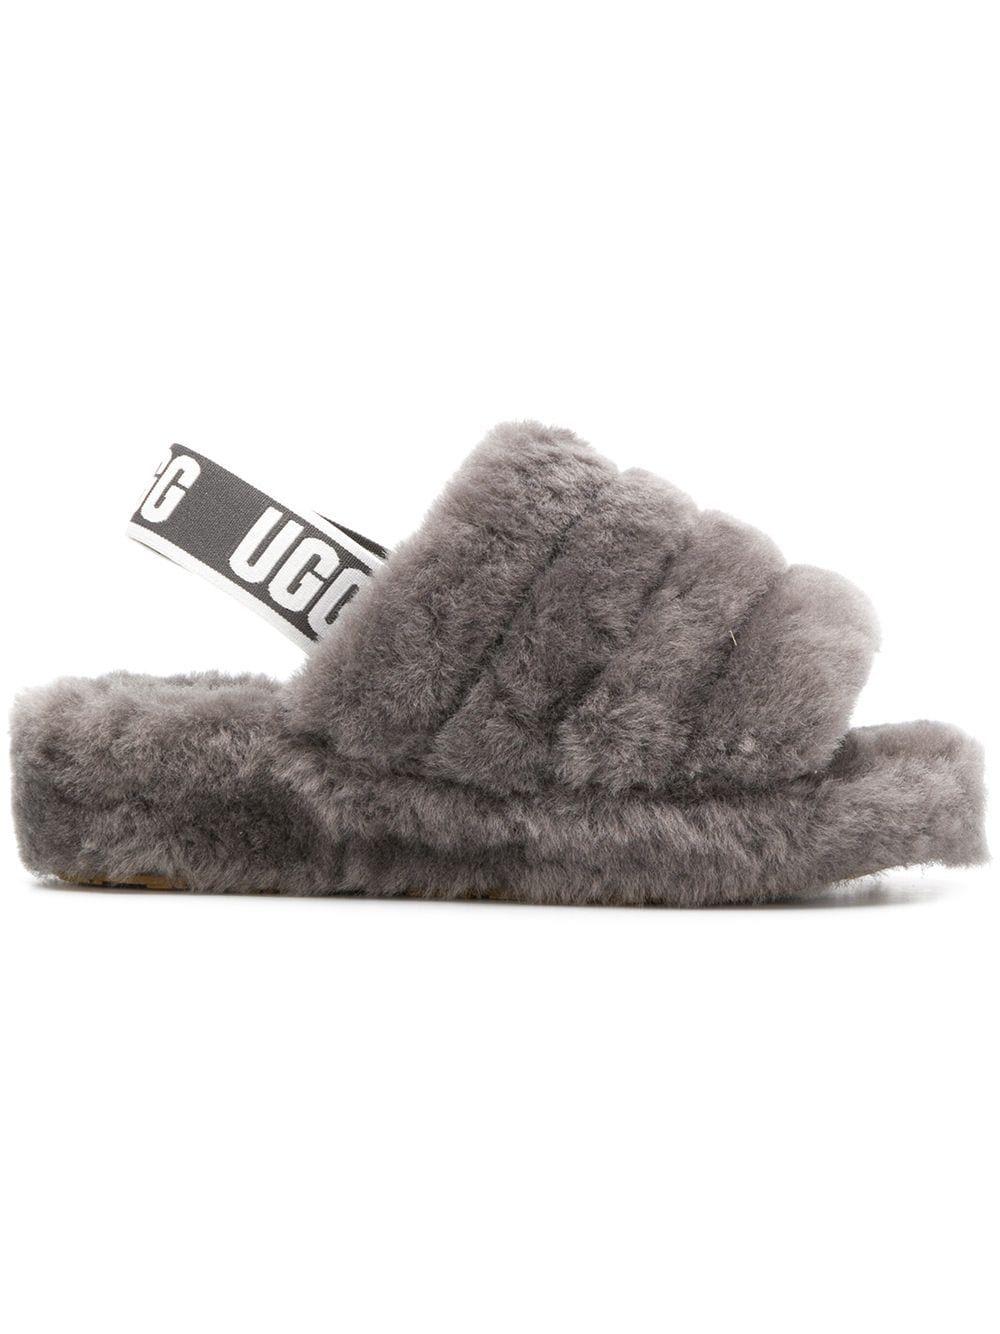 Ugg Slingback Woolly Slippers Farfetch Grey Ugg Slippers Ugg Slippers Uggs